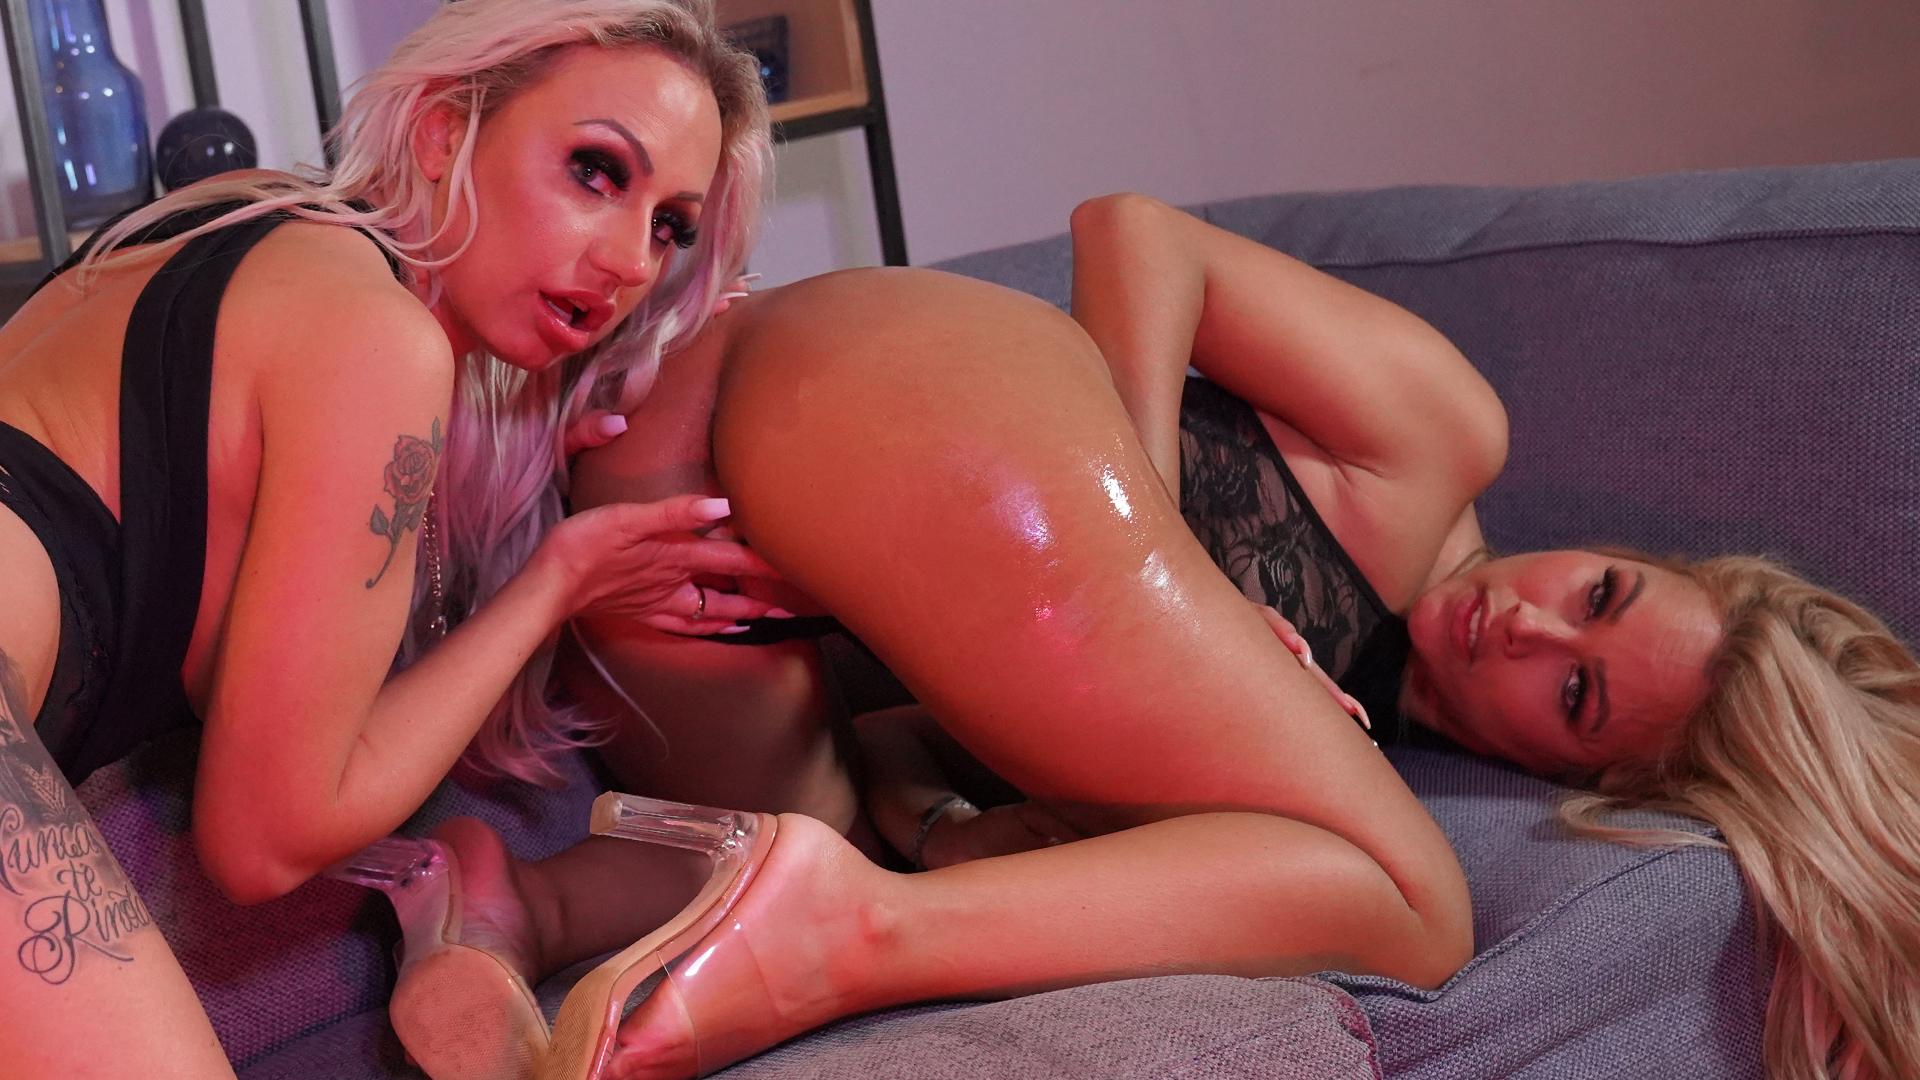 Geile foto van de hete Secret Circle seksfilm: Milena en Sashas sexy shoot